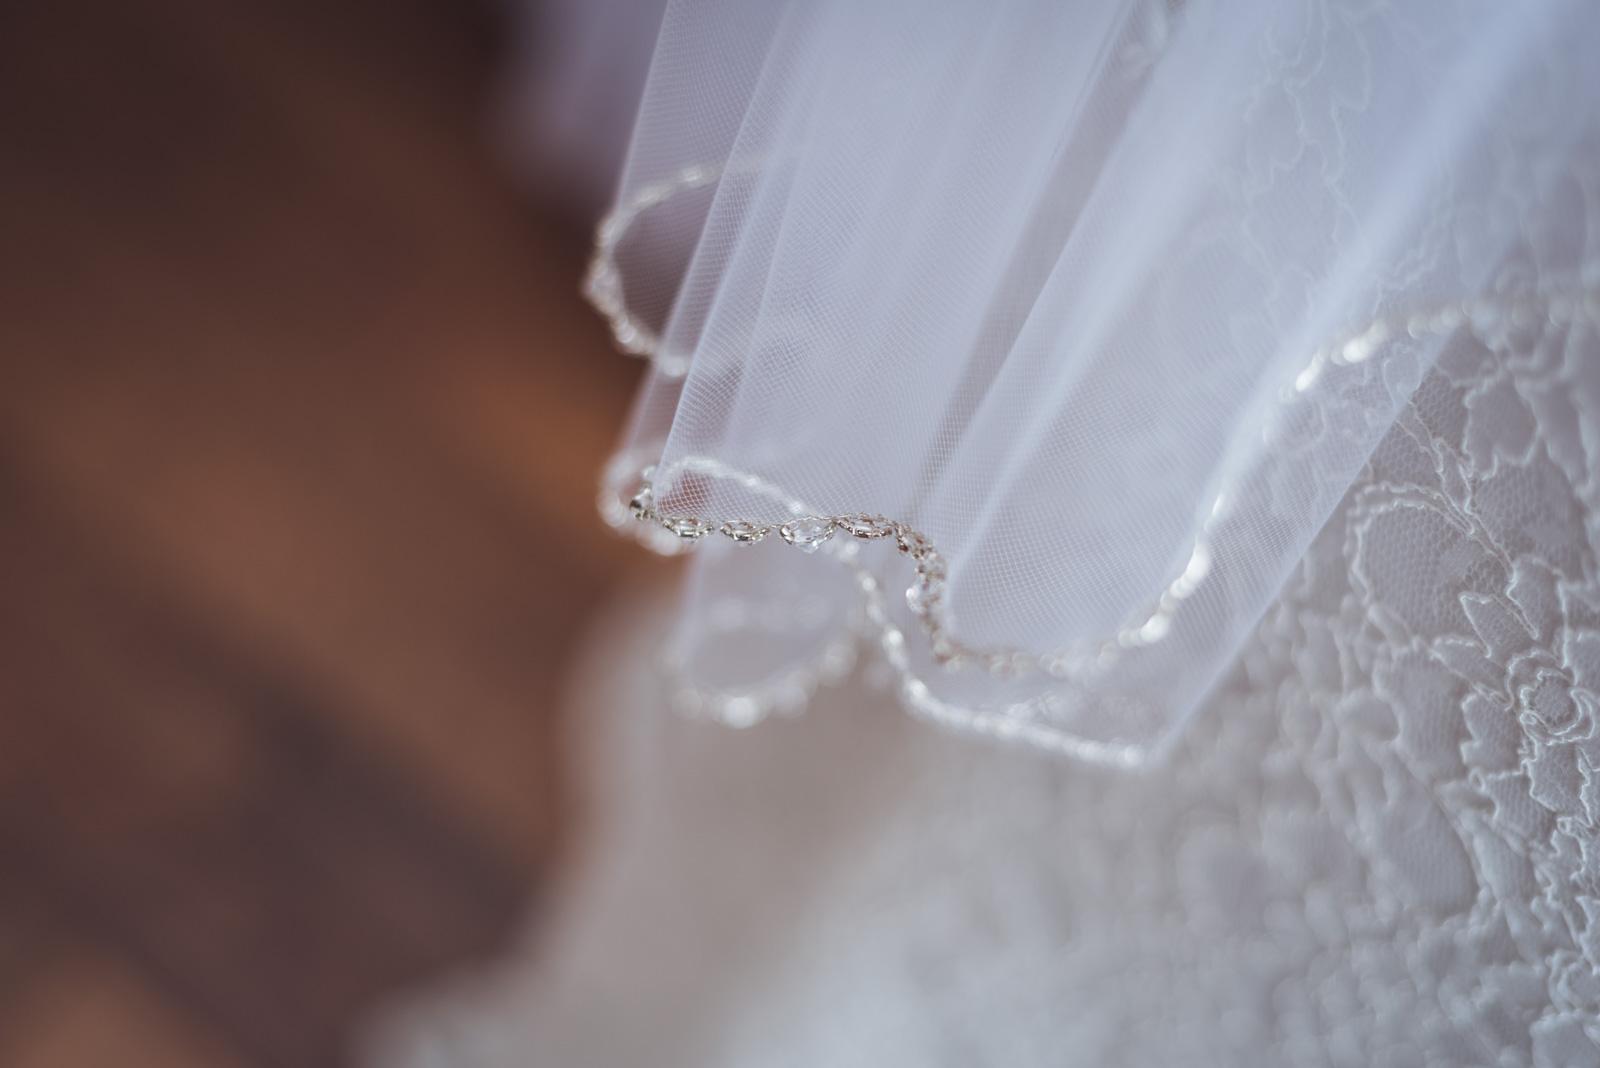 rheana-chris-wedding-blog-78.jpg